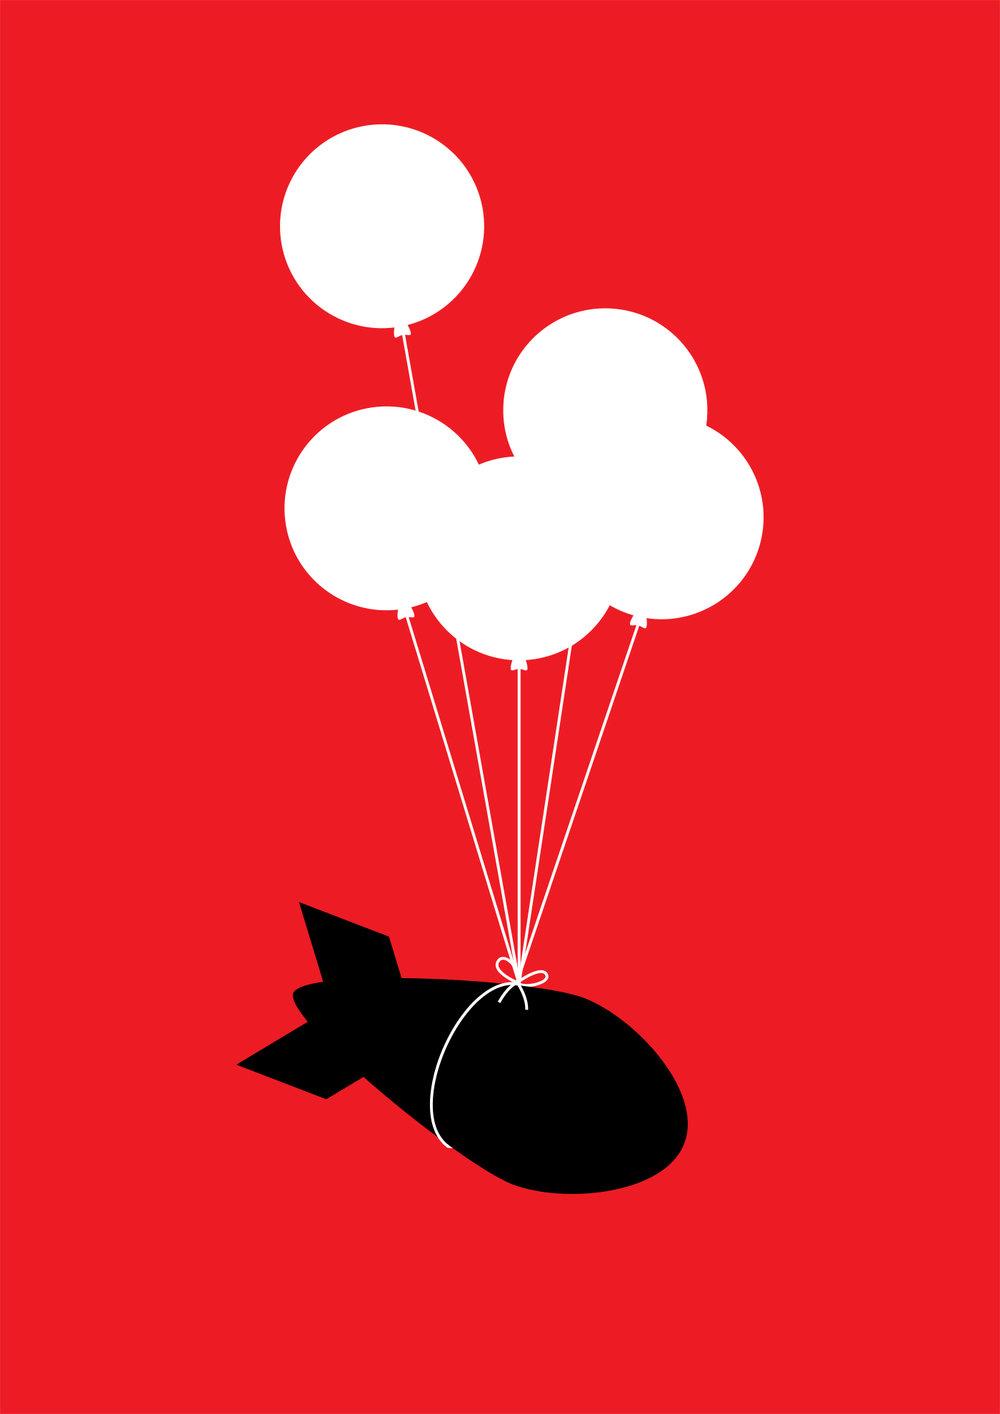 13-Red Balloon-1400px.jpg